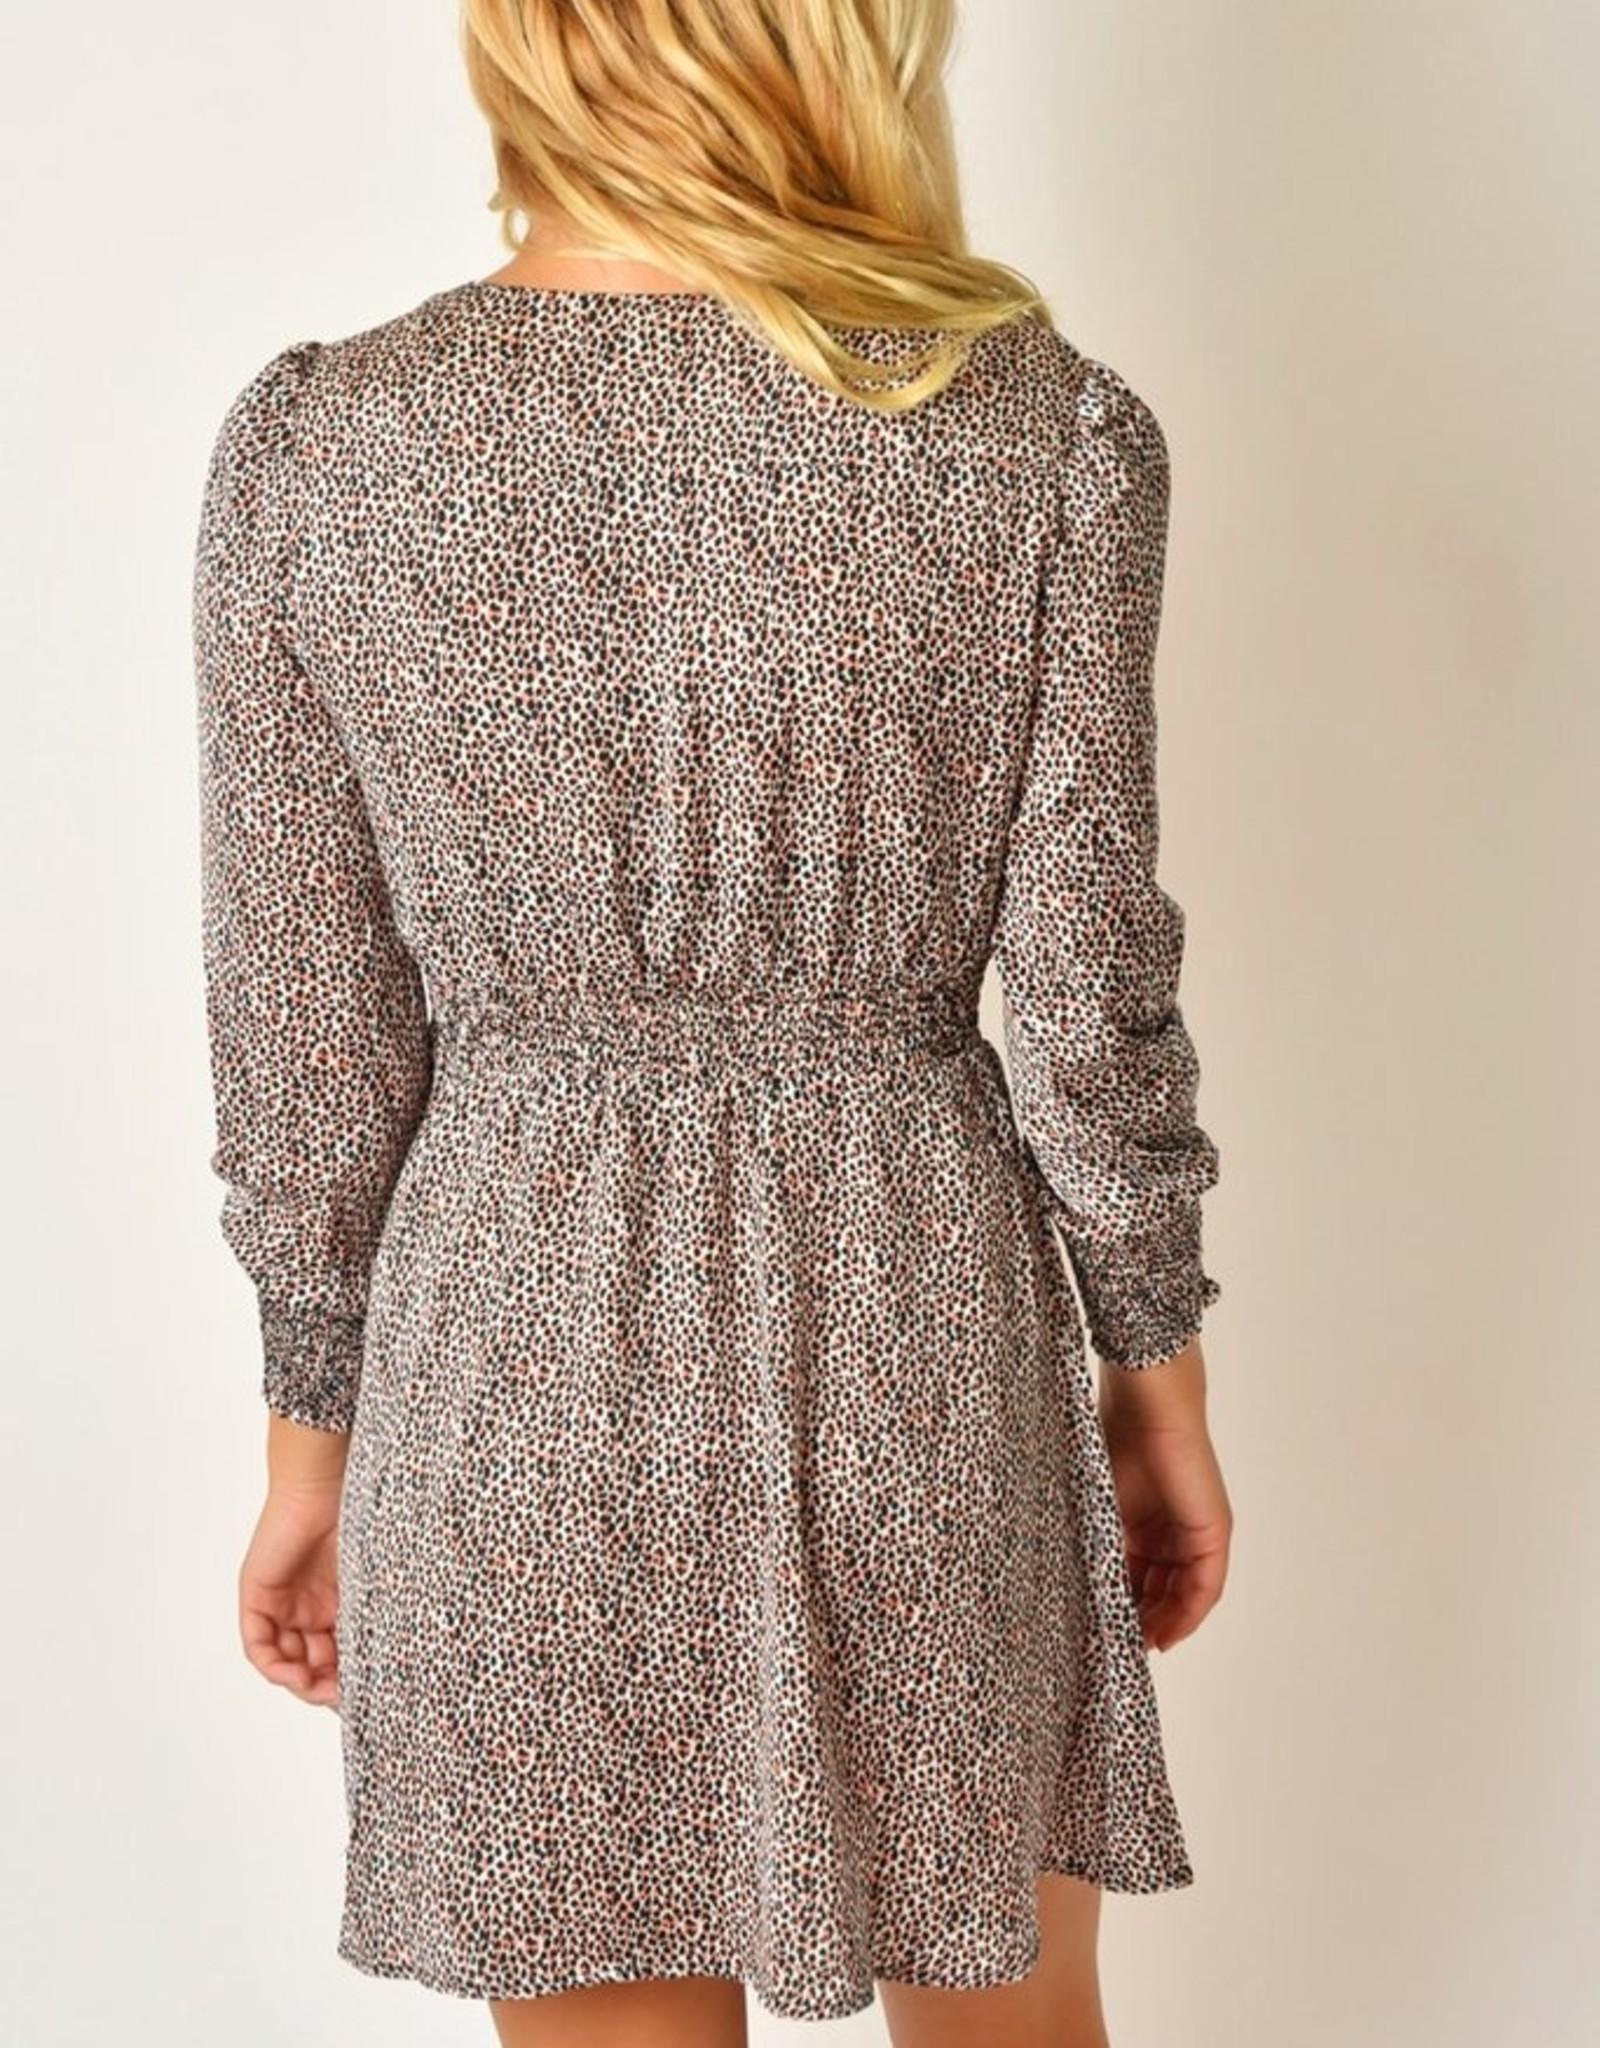 BB Dakota Wild Dreaming Dress